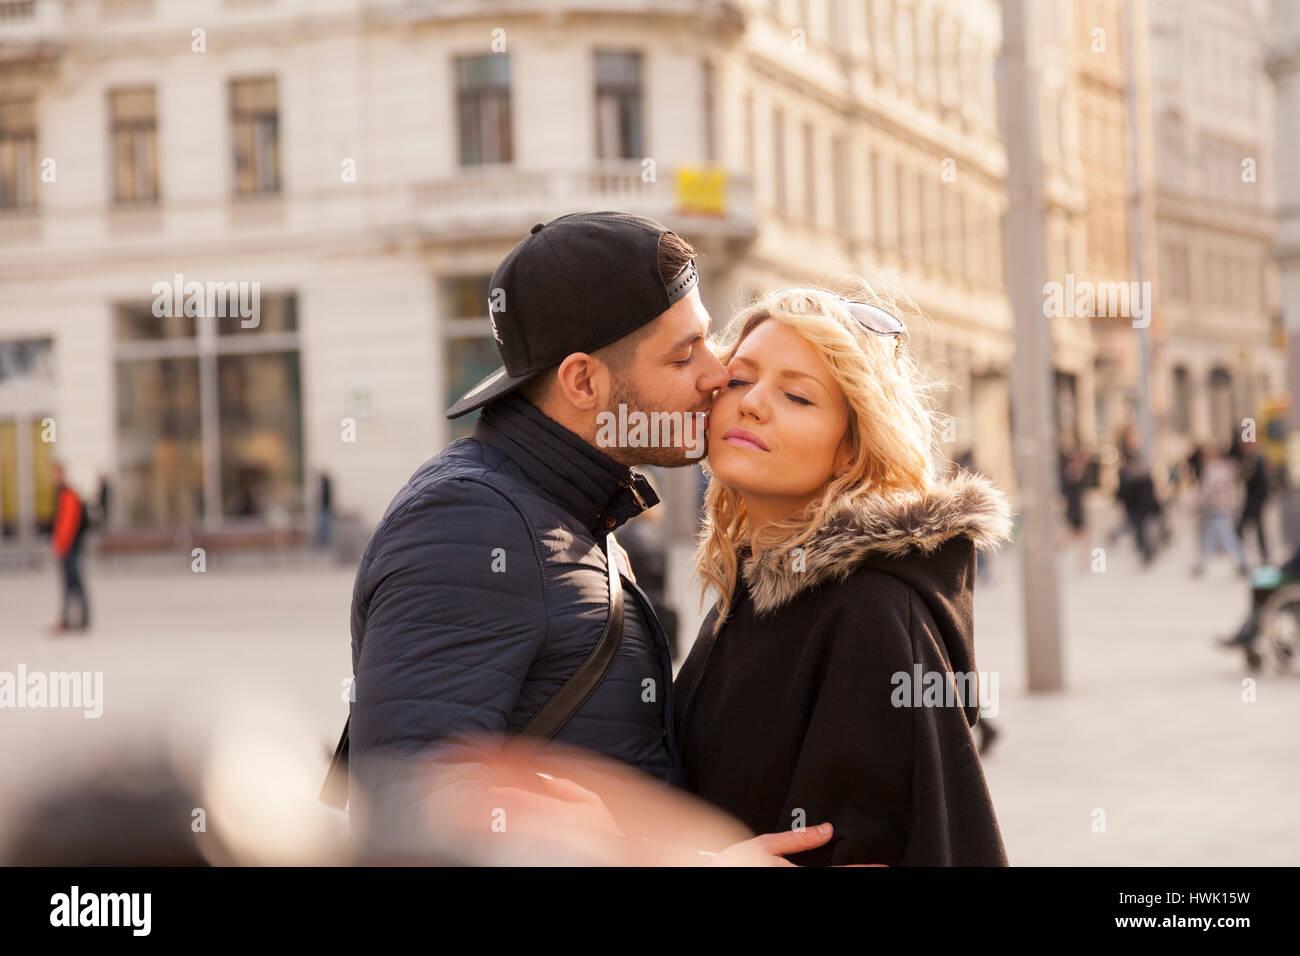 downtown dating gratis dating russiske singler